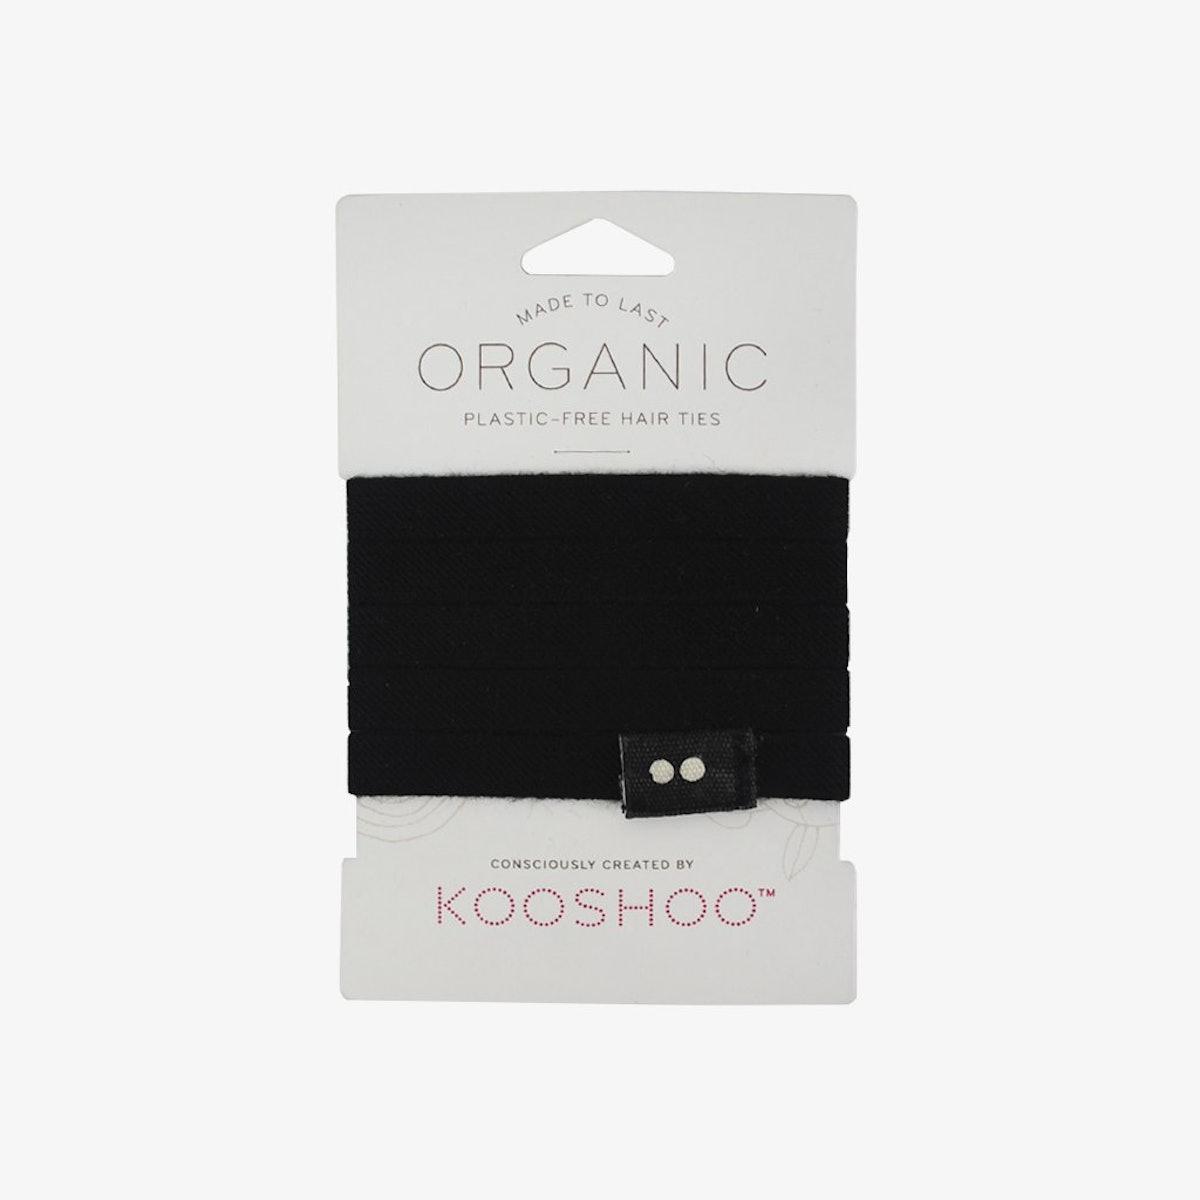 Organic Plastic-Free Hair Ties